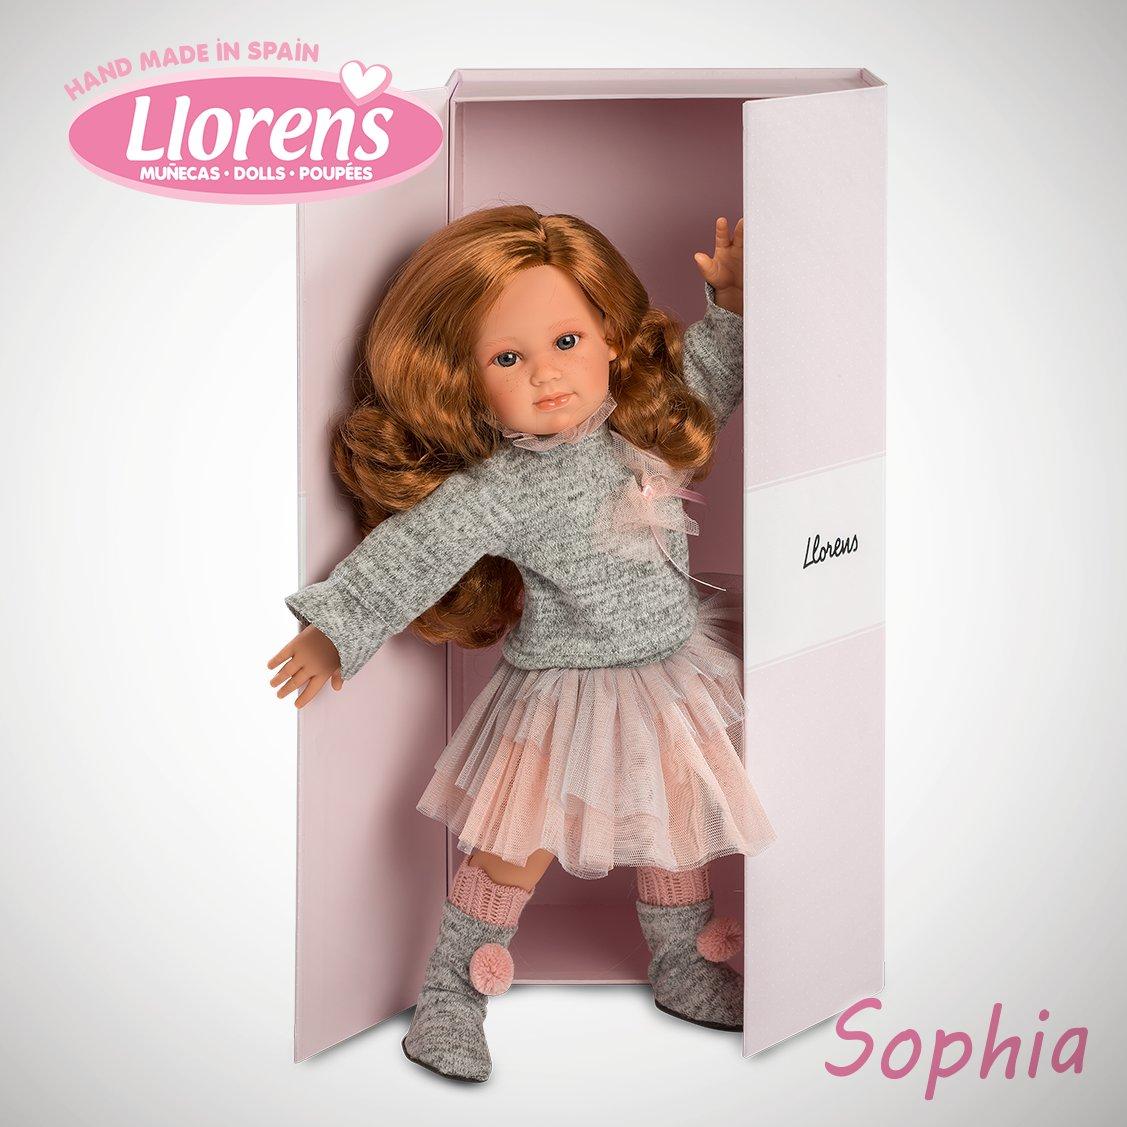 Куклы Llorens — сестры знаменитых кукол Antonio Juan